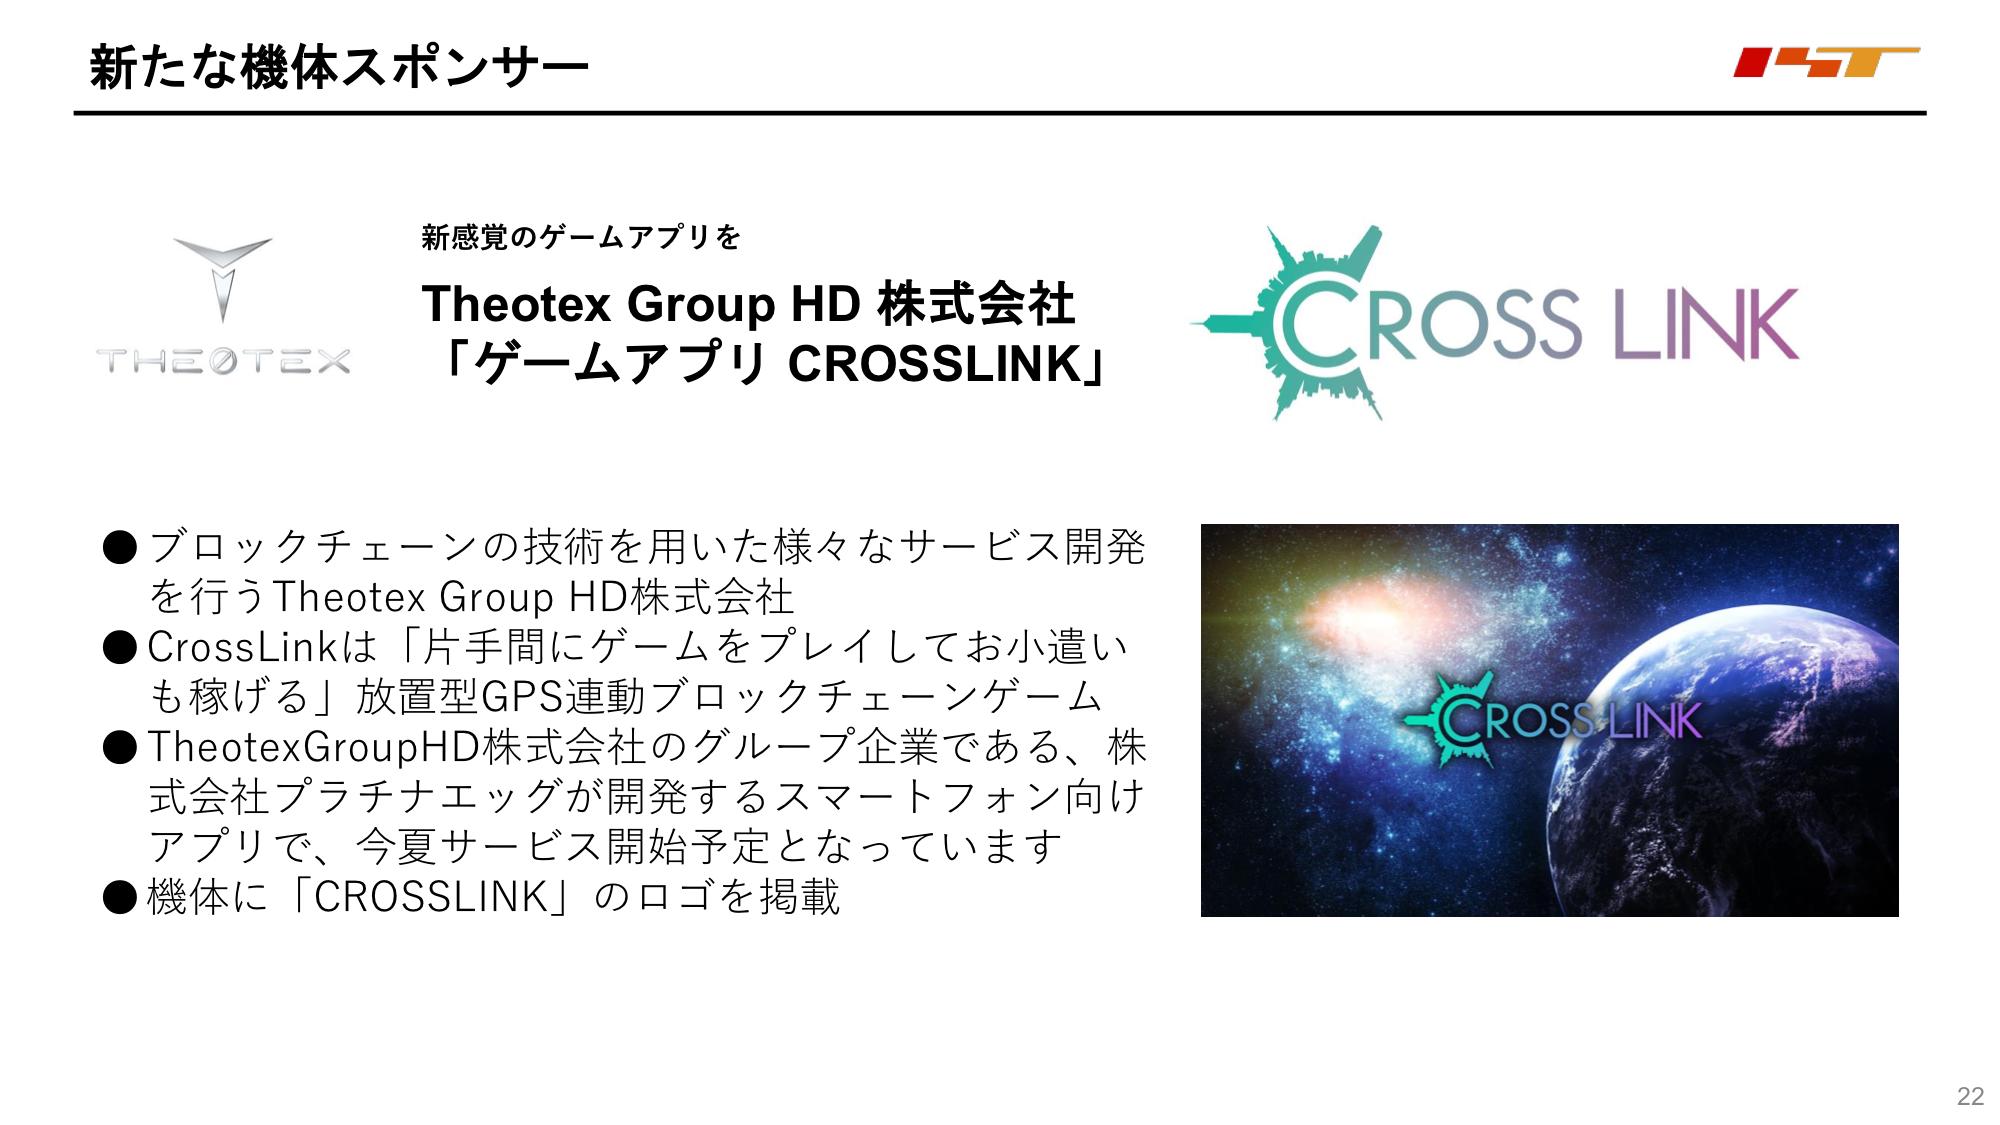 f:id:Imamura:20200603232925p:plain